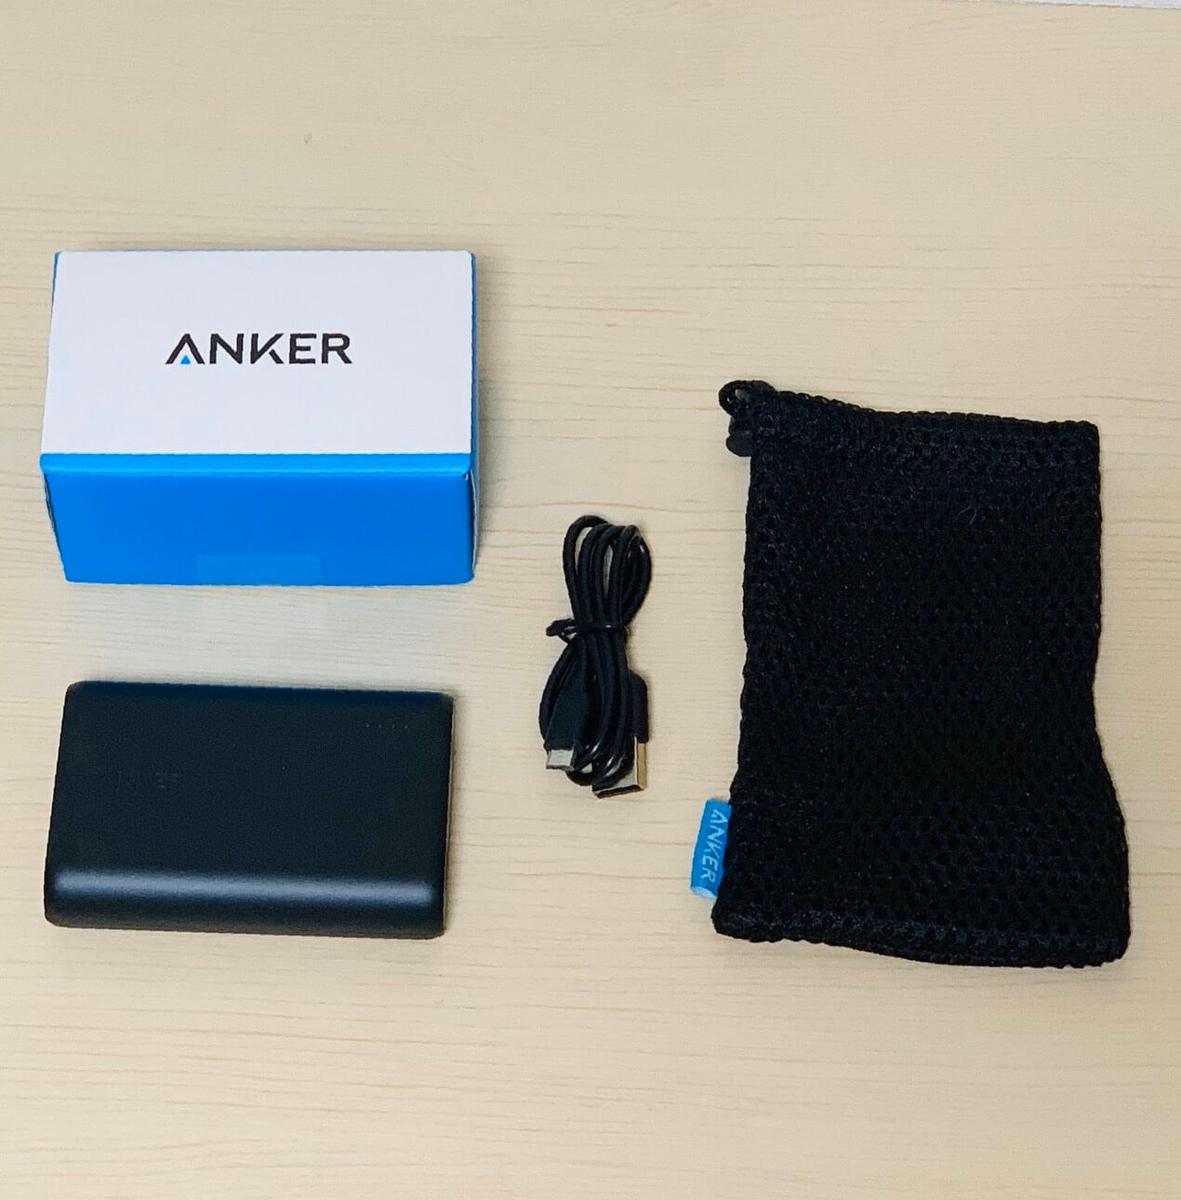 『Anker PowerCore 10000』買ってみたよ!